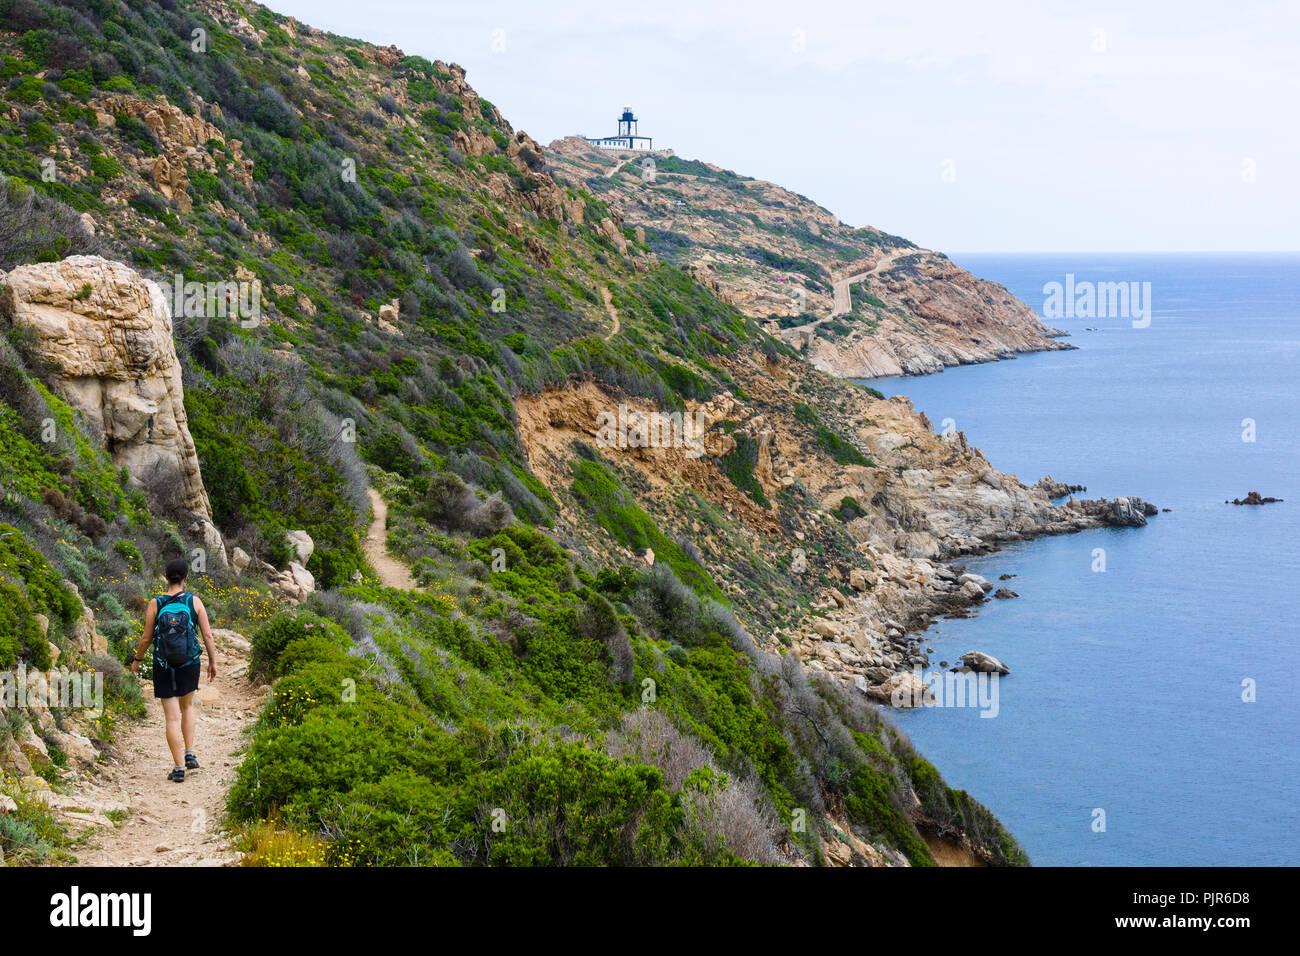 Sentier de La Revellata Wanderweg, Pointe de La Revellata, Calvi, Korsika, Frankreich Stockbild